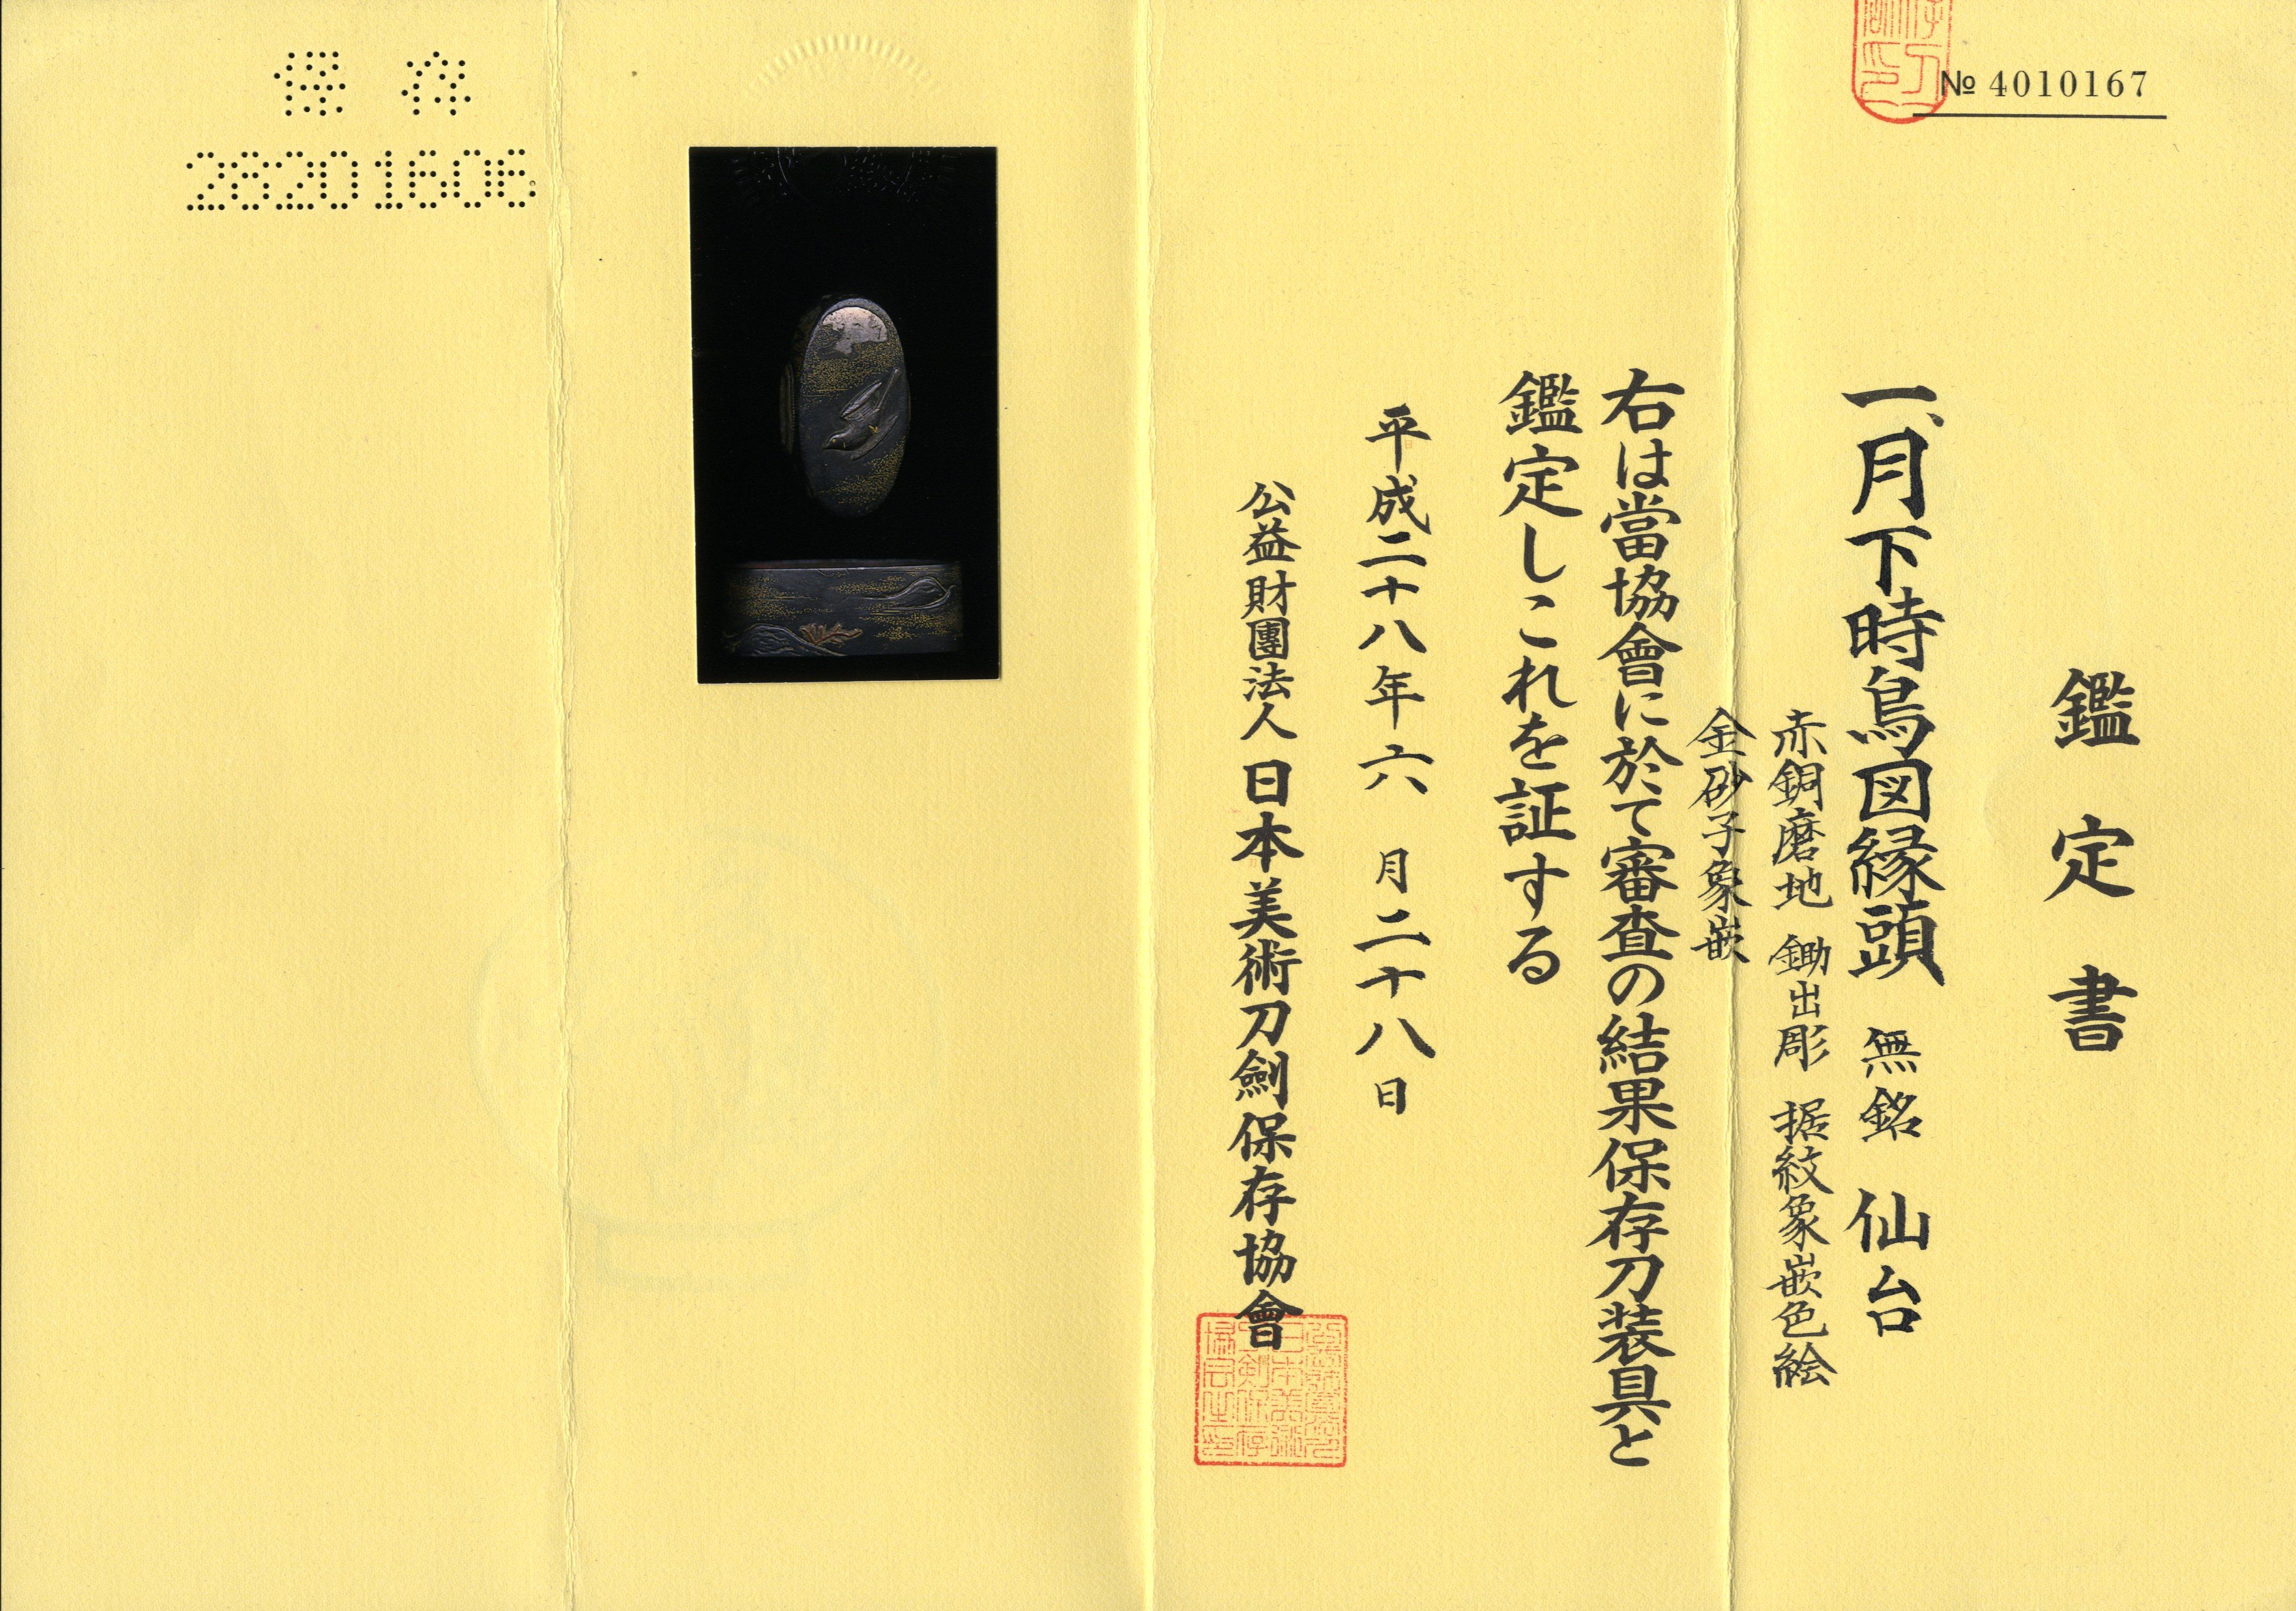 05-386